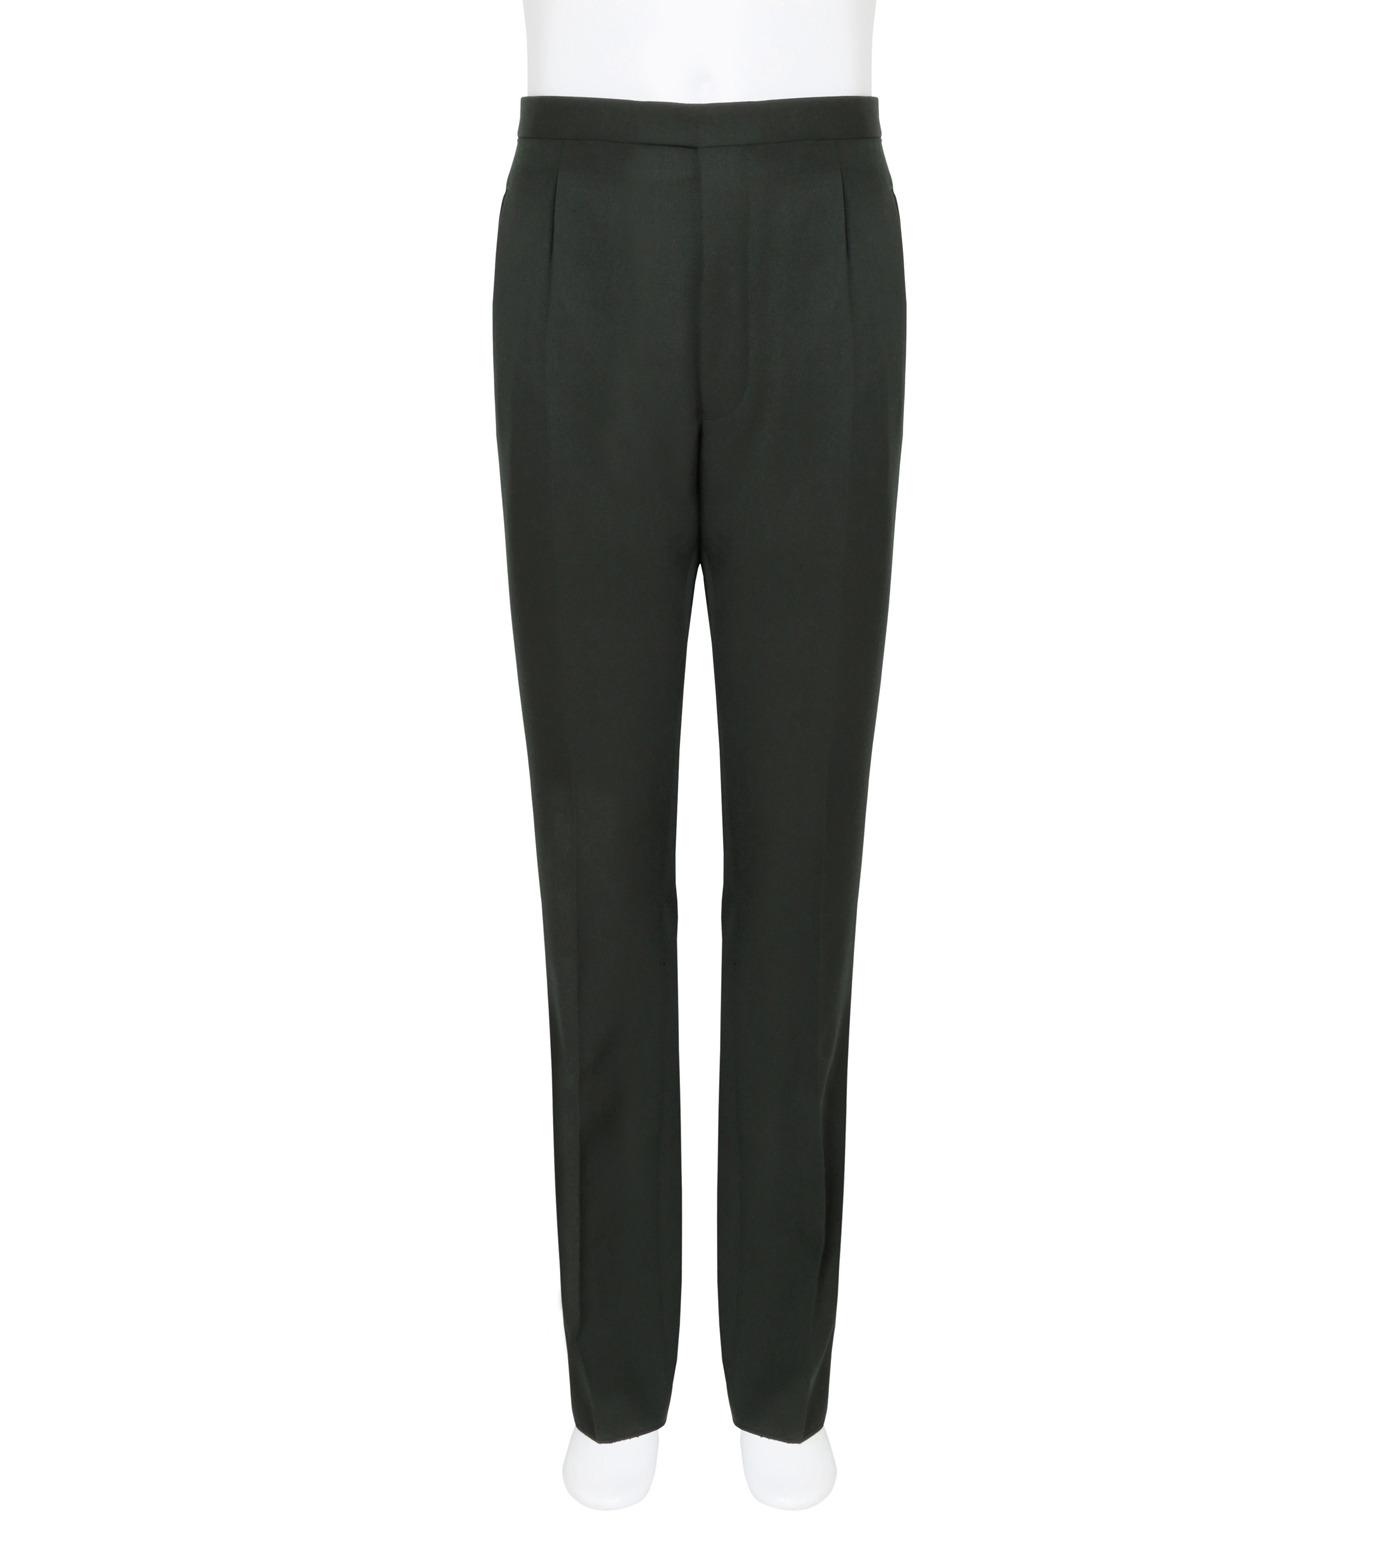 RAF SIMONS(ラフシモンズ)のSlim Trousers-GREEN(パンツ/pants)-341-20017-22 拡大詳細画像1